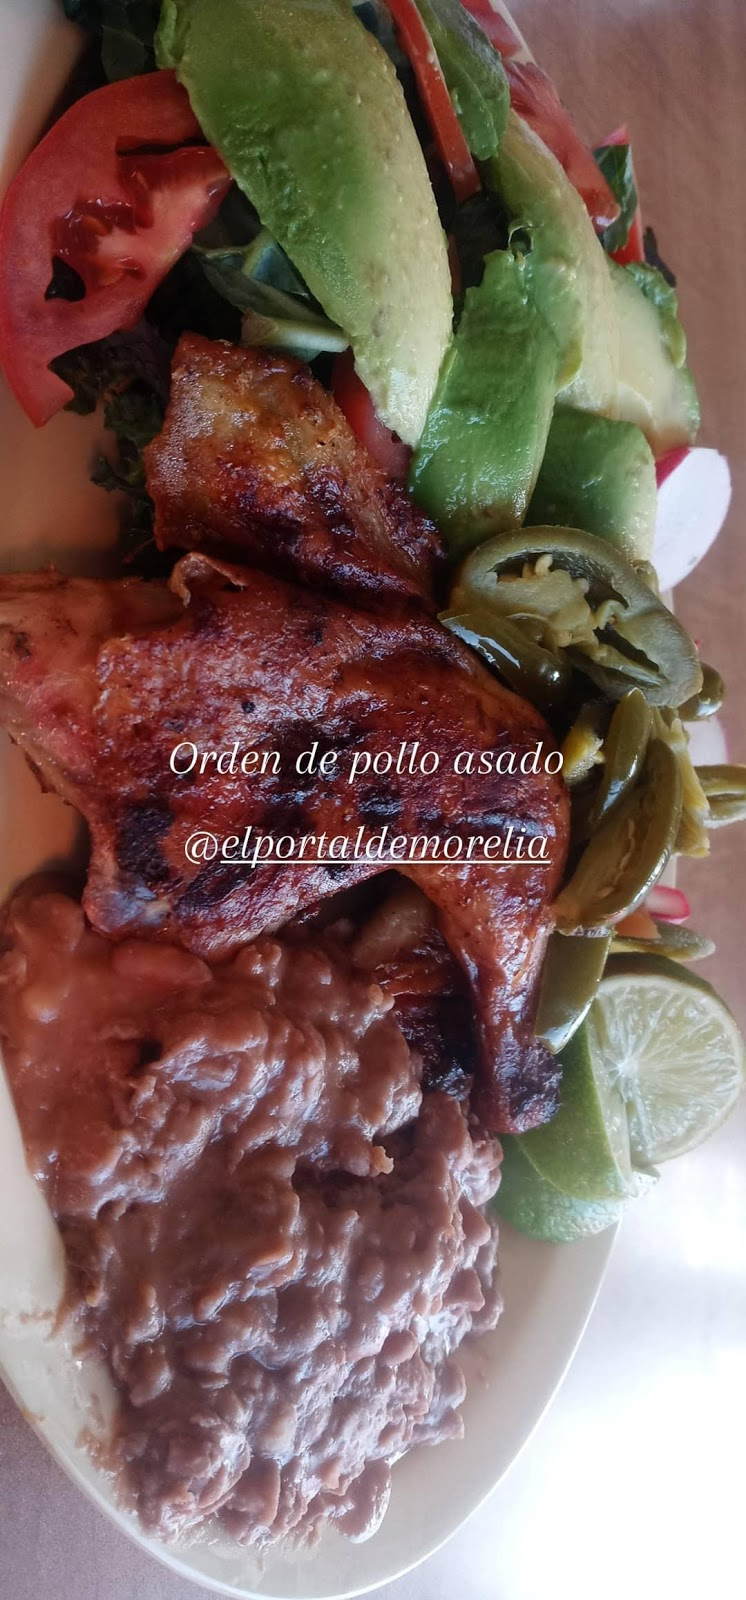 El Portal De Morelia - restaurant  | Photo 10 of 10 | Address: 3601 Foothill Blvd, Oakland, CA 94601, USA | Phone: (510) 395-2595